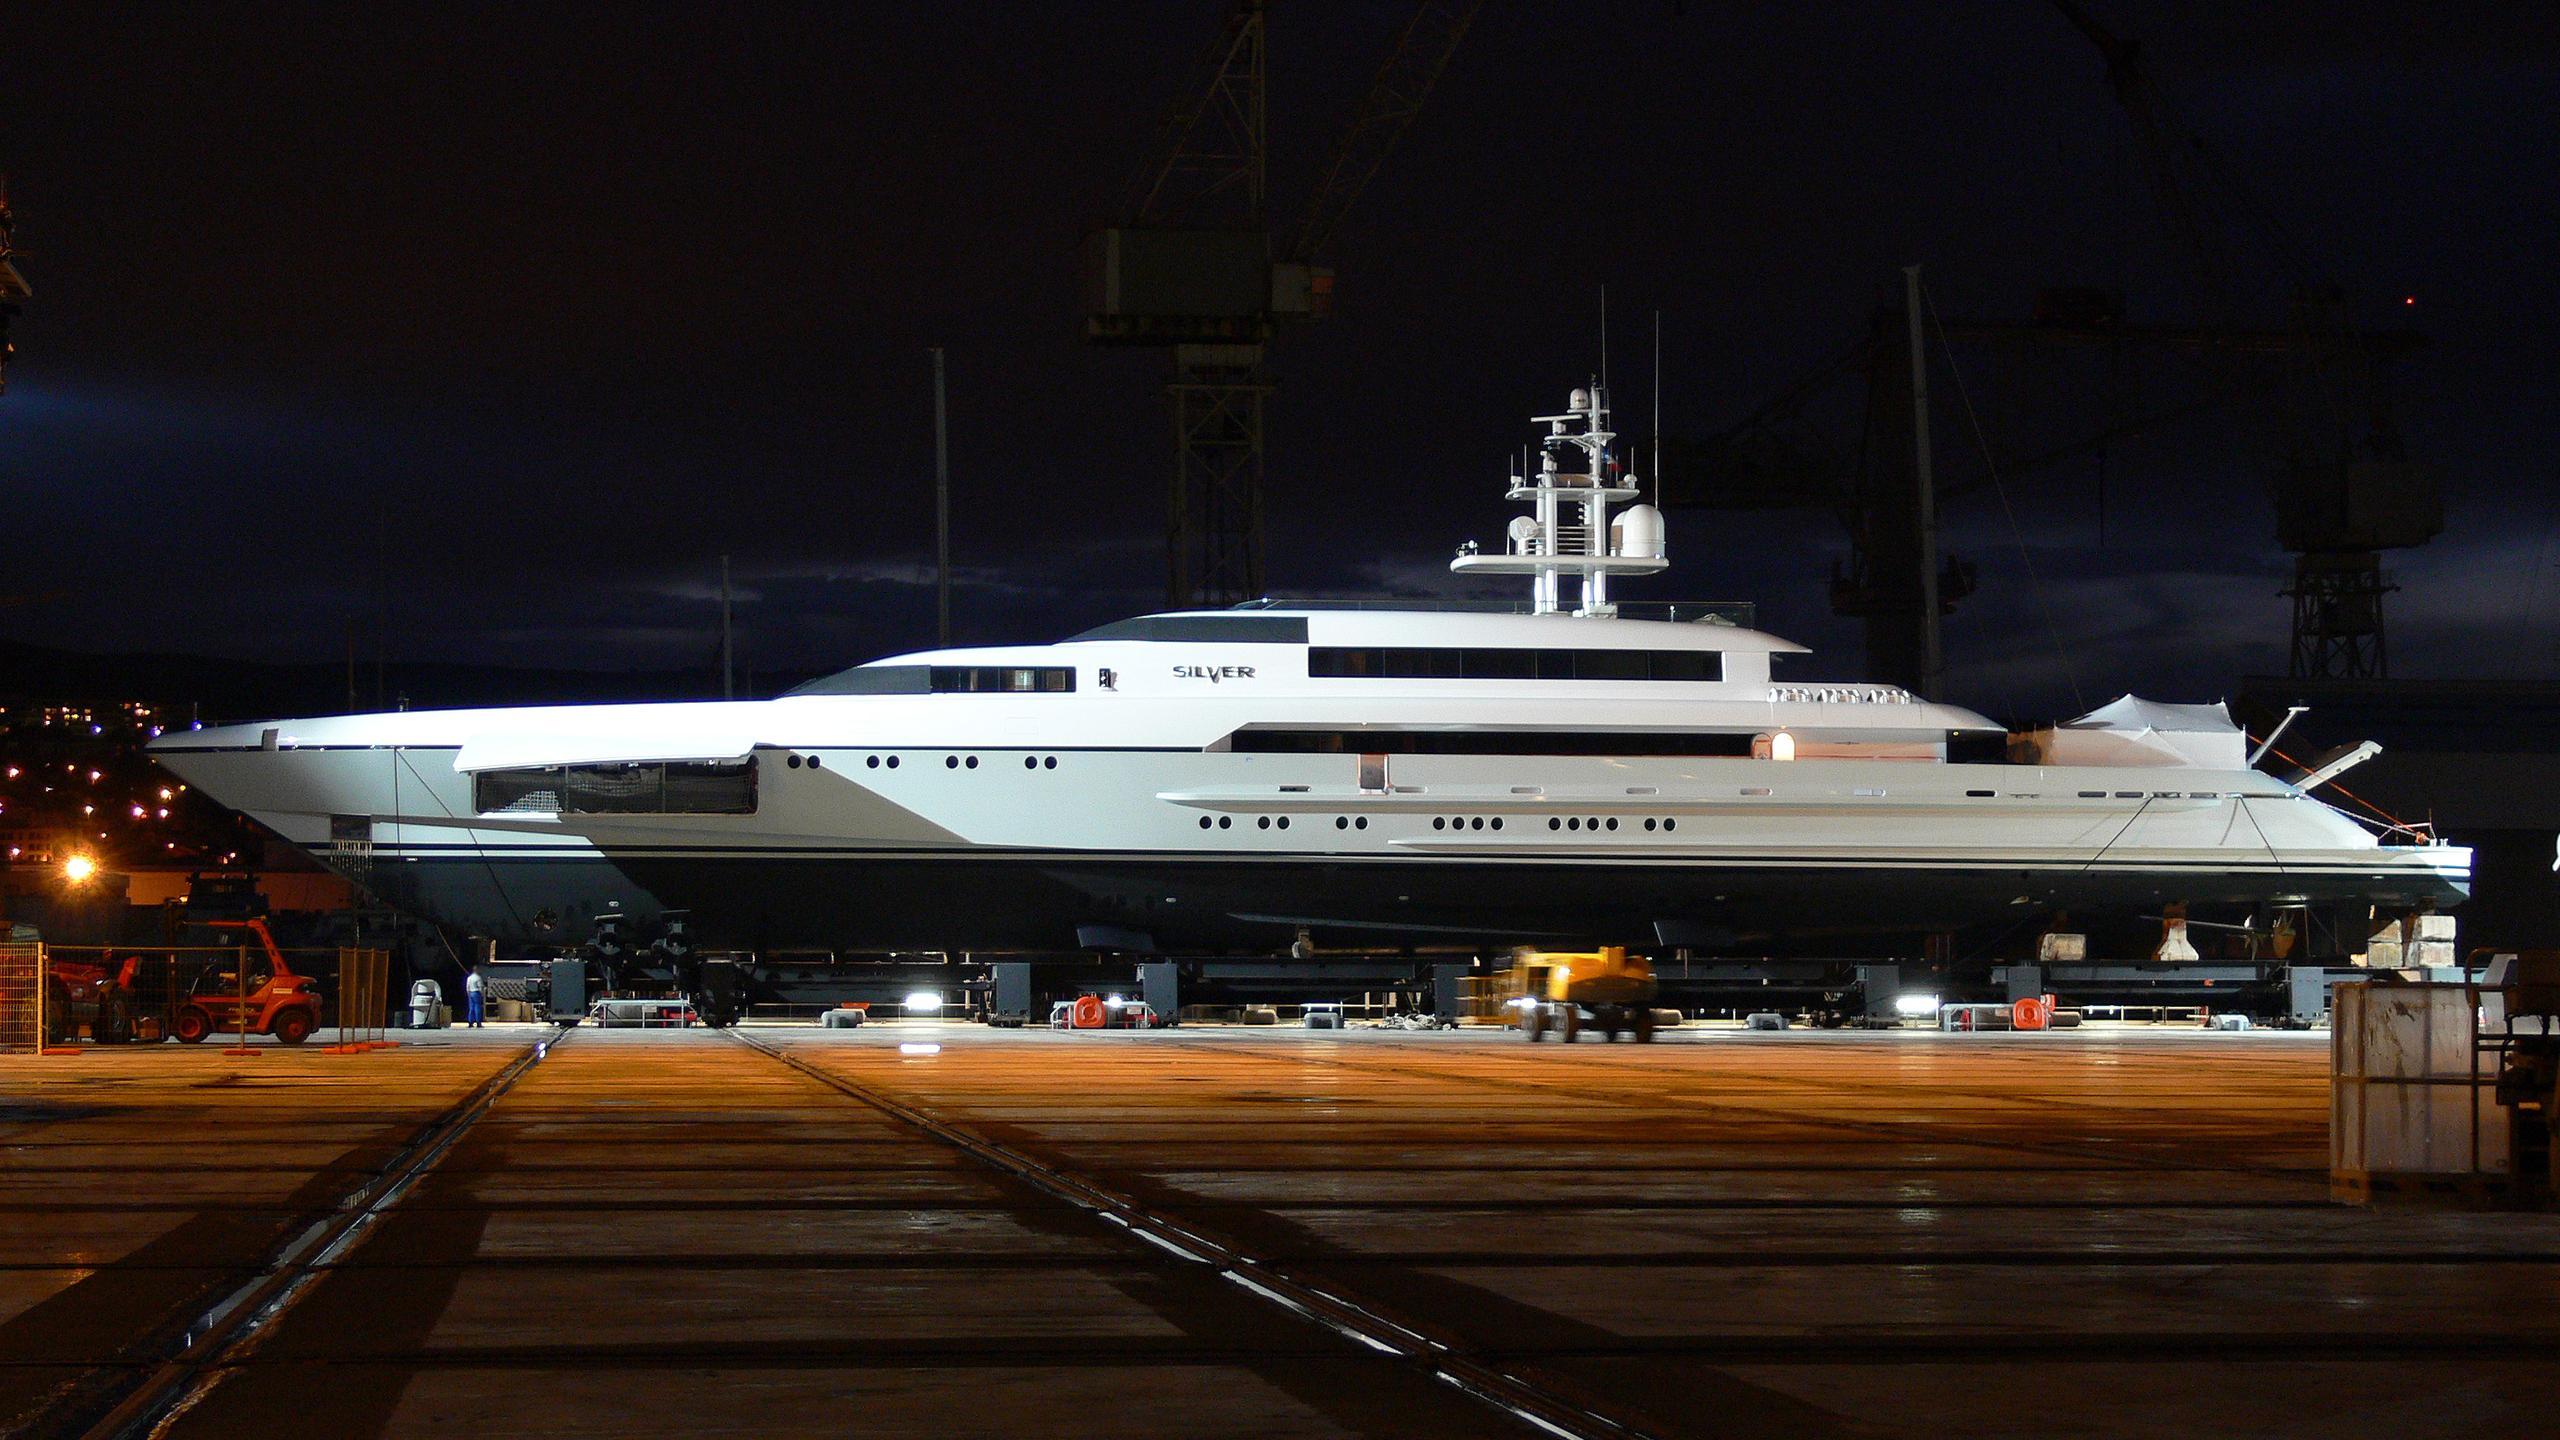 rabdan-motor-yacht-silver-2007-73m-profile-shipyard-by-night